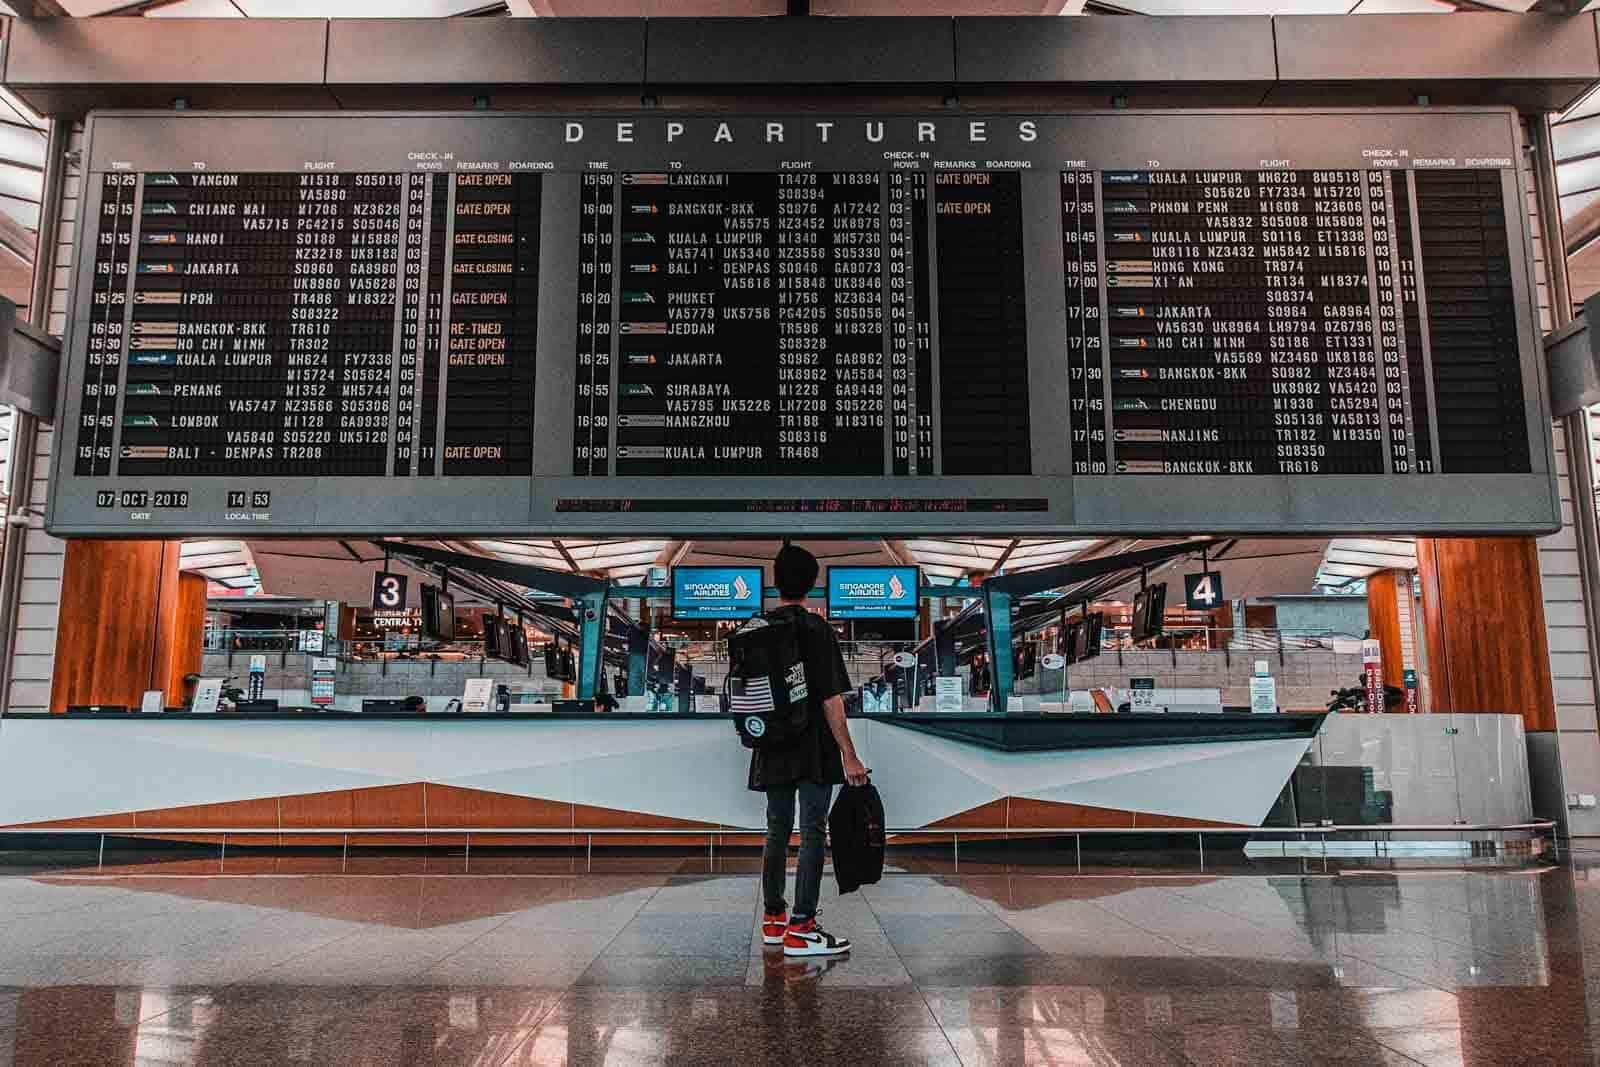 departures-airport-aeropuerto-daniel-lim-unsplash